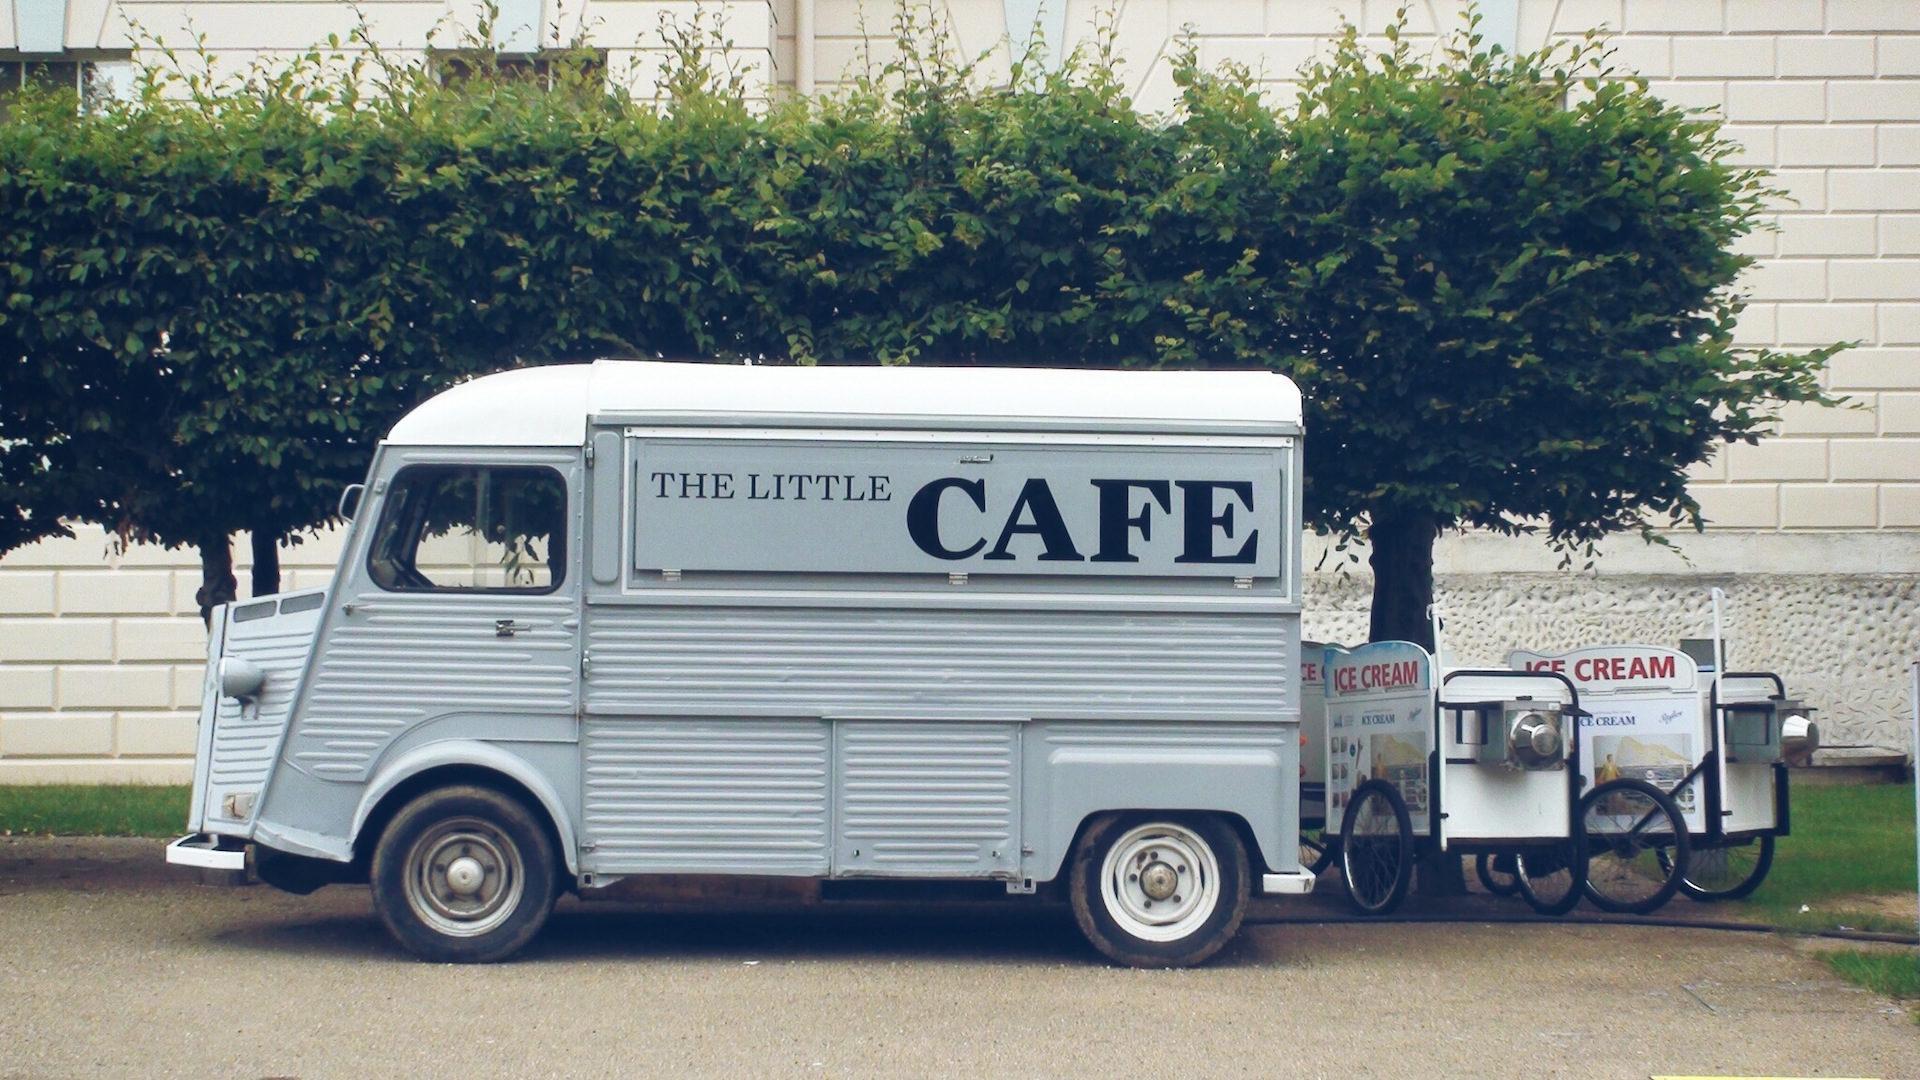 Van, Cafe, caffè, business, alberi - Sfondi HD - Professor-falken.com